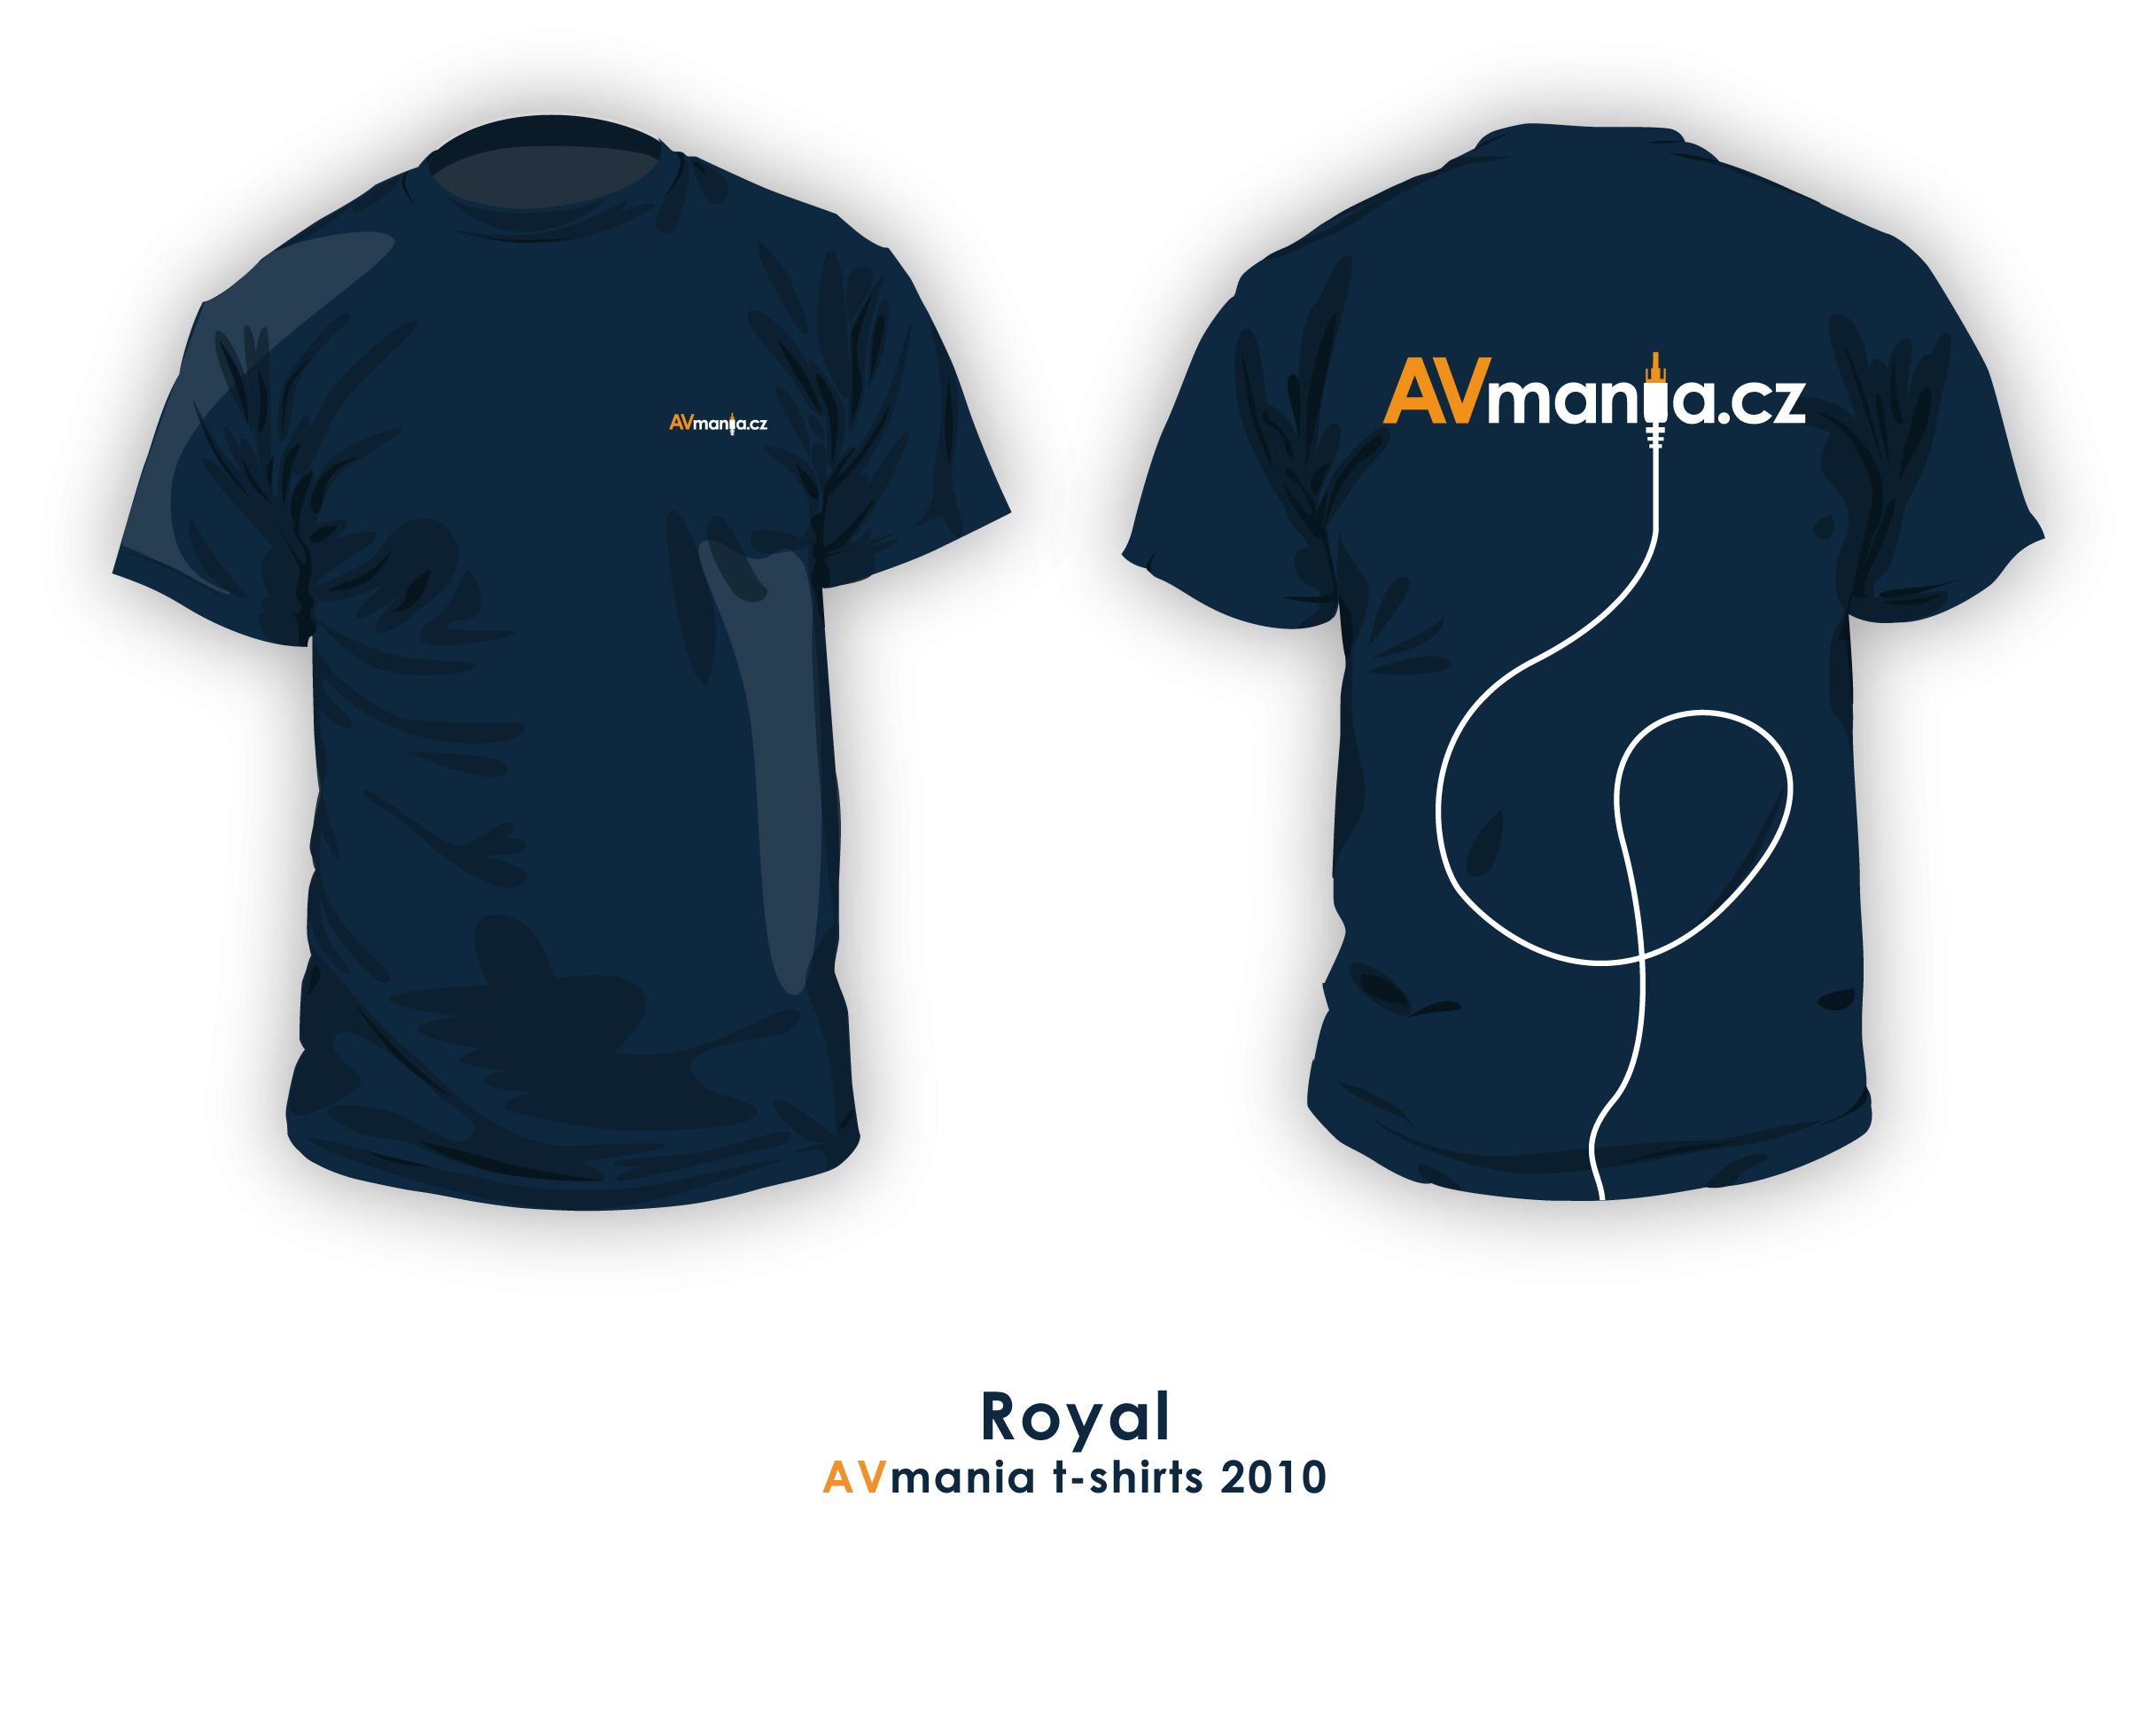 8c8c101d0dac Trička Avmanie (solved) - AVmania.cz